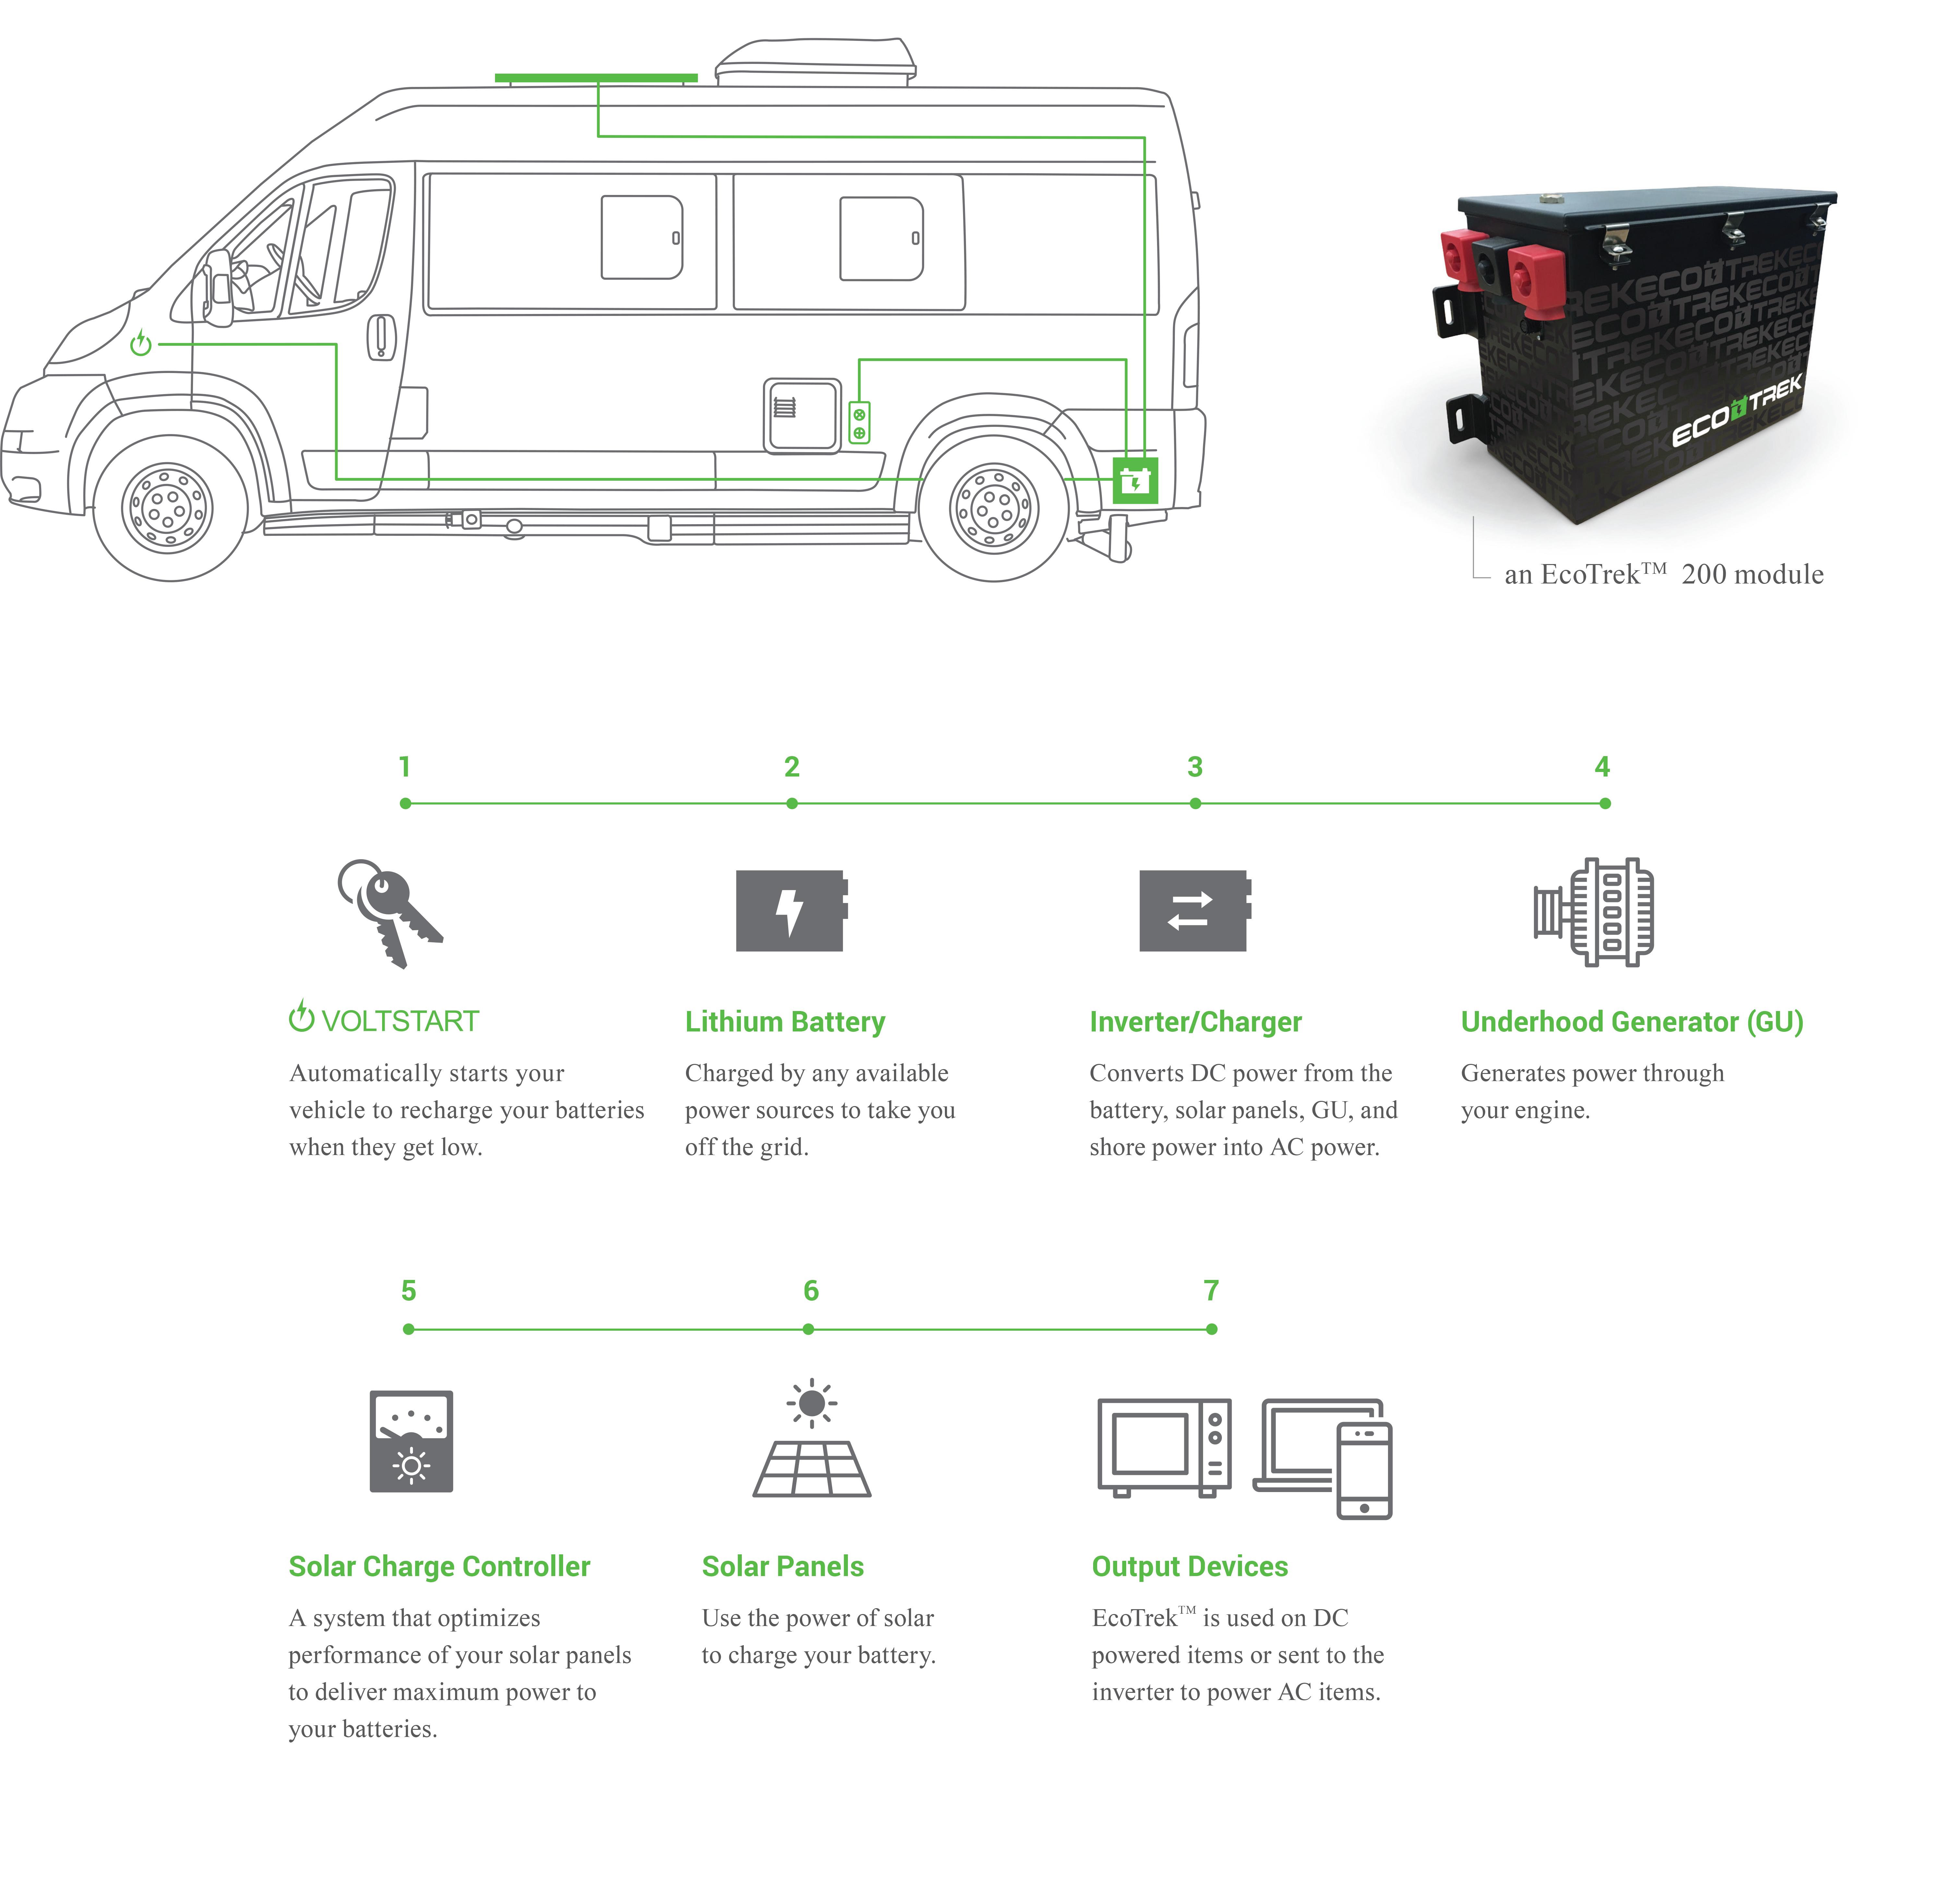 EcoTrek lithium power module by RoadtrekRoadtrek